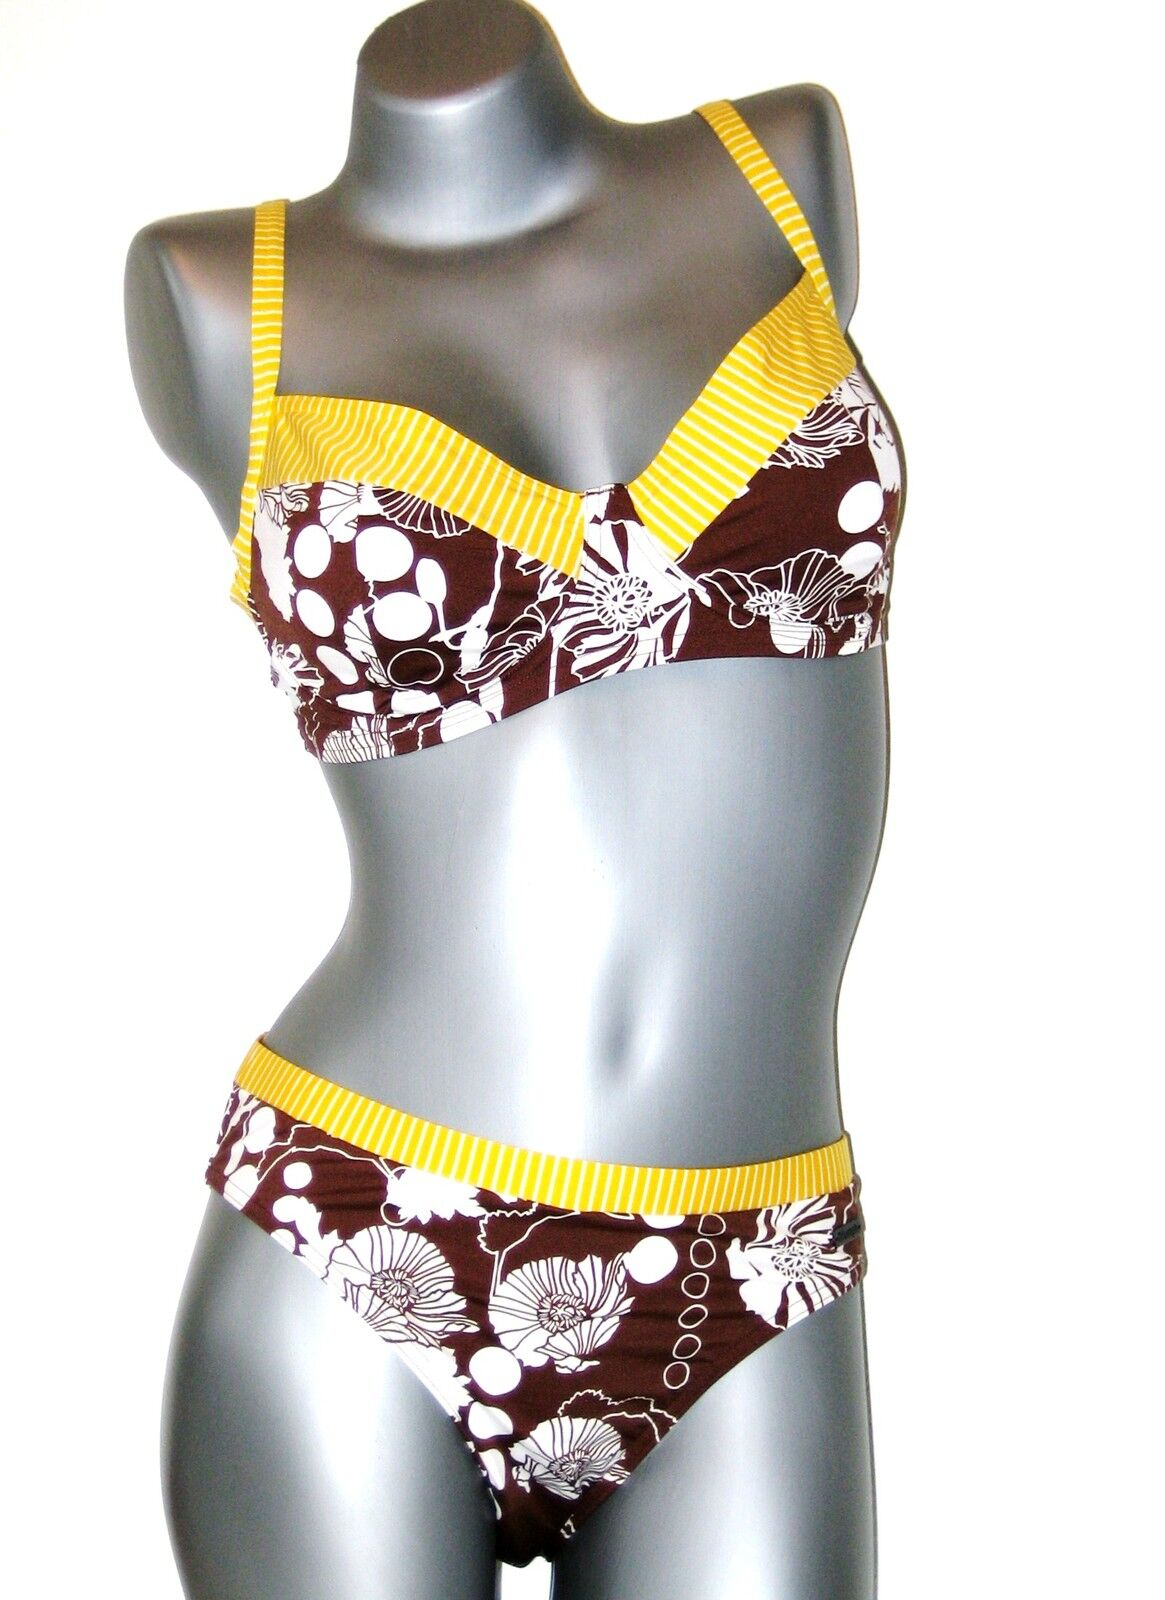 Triumph Bikini Set  -  85 C + 44 Tai  -  brown yellow white  col M003 T5  NEU